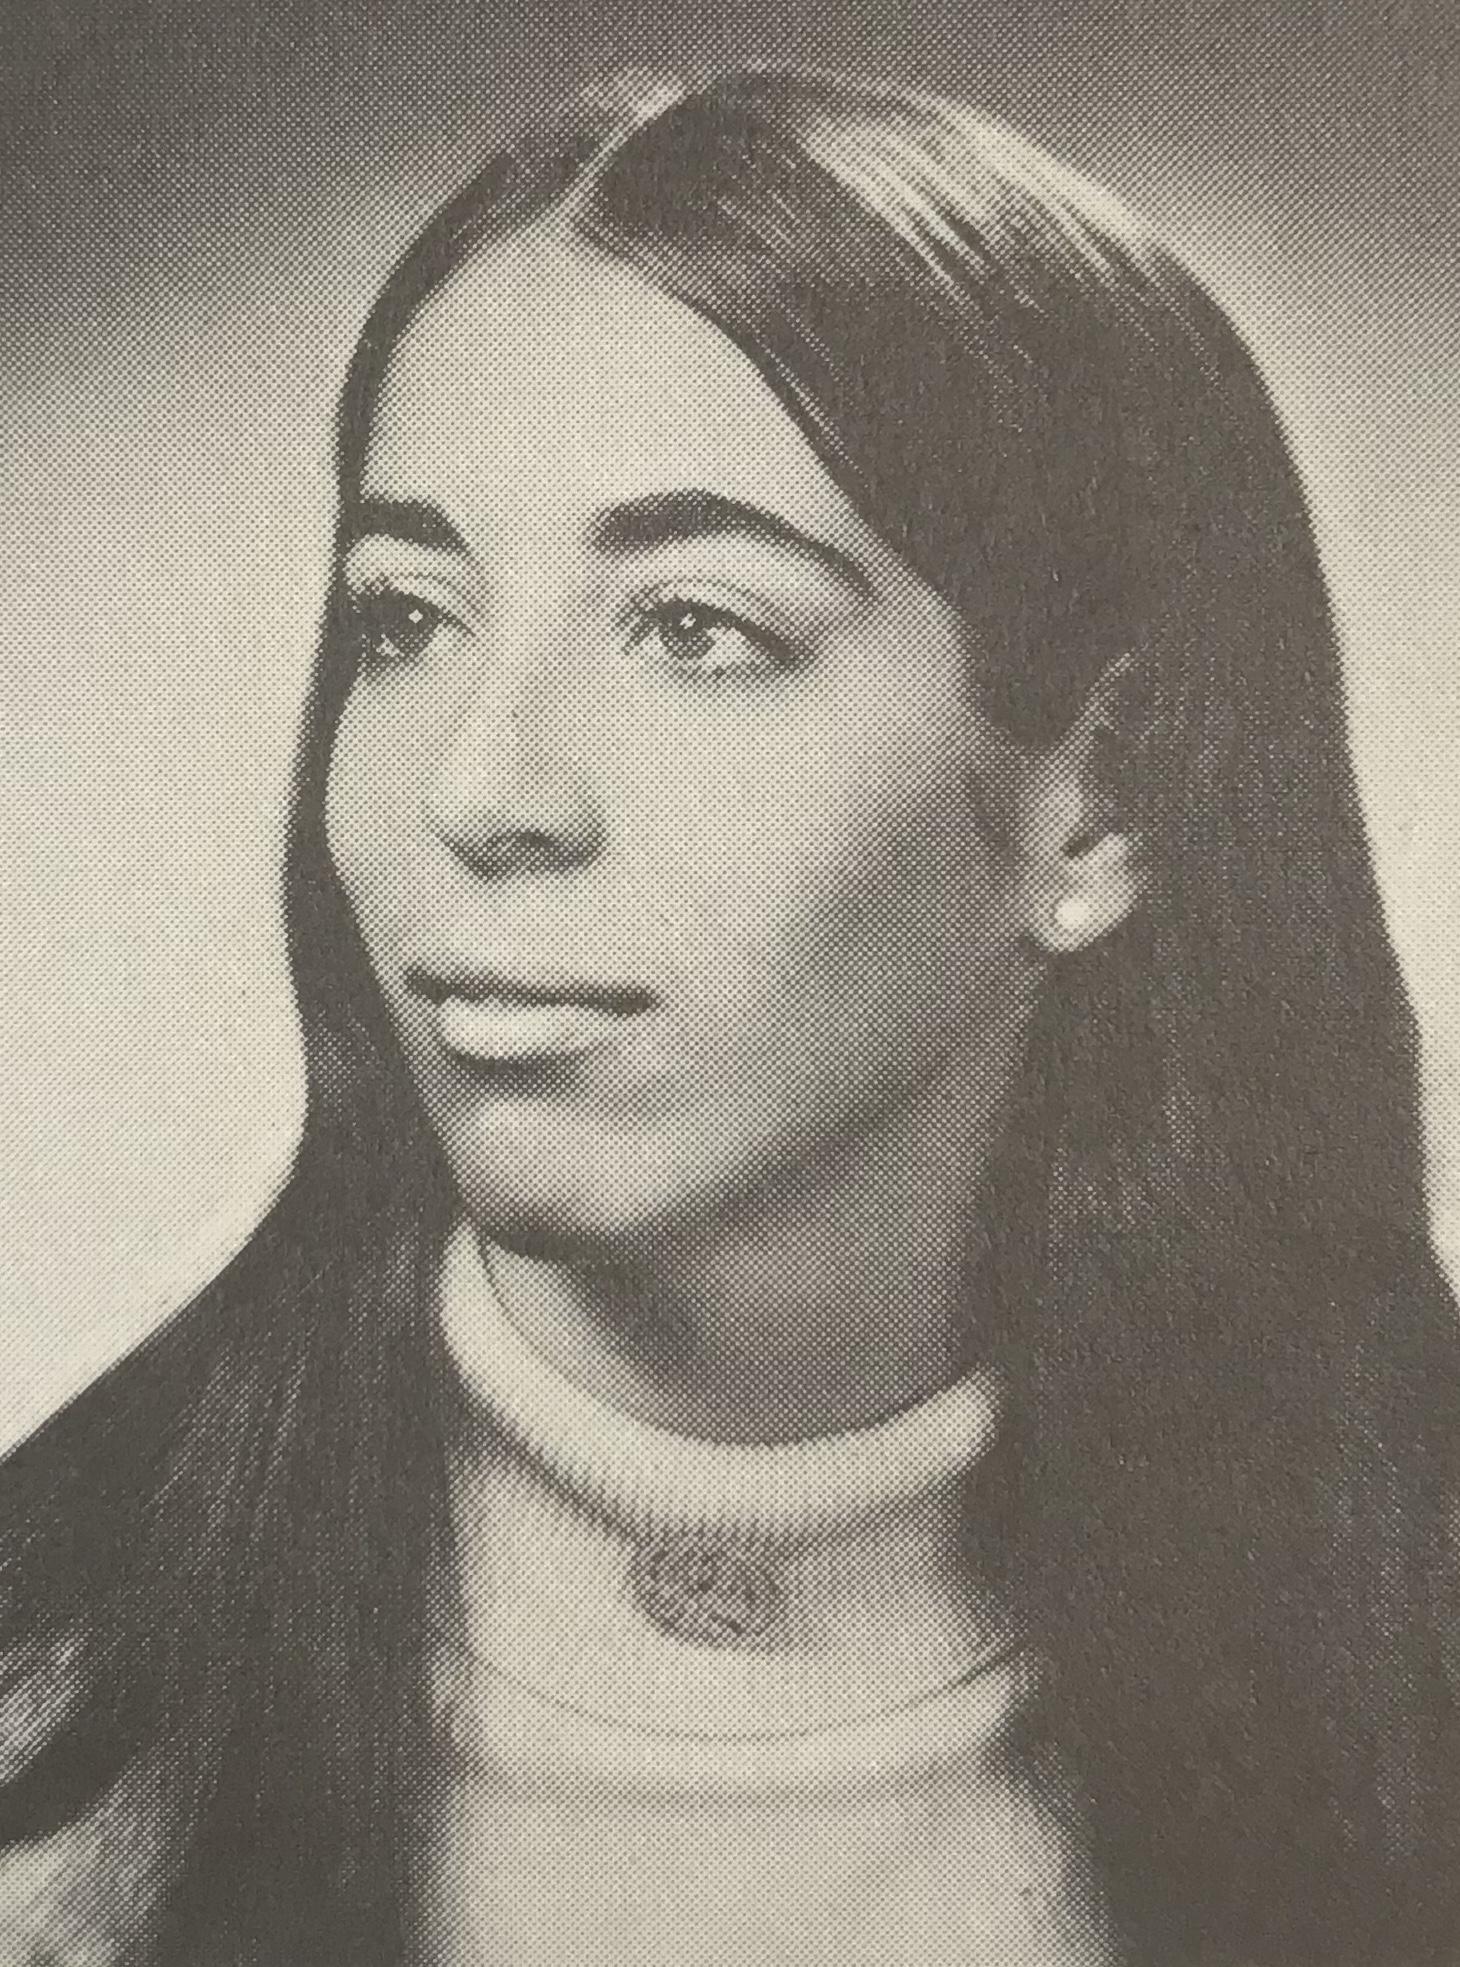 Rhona Drossman